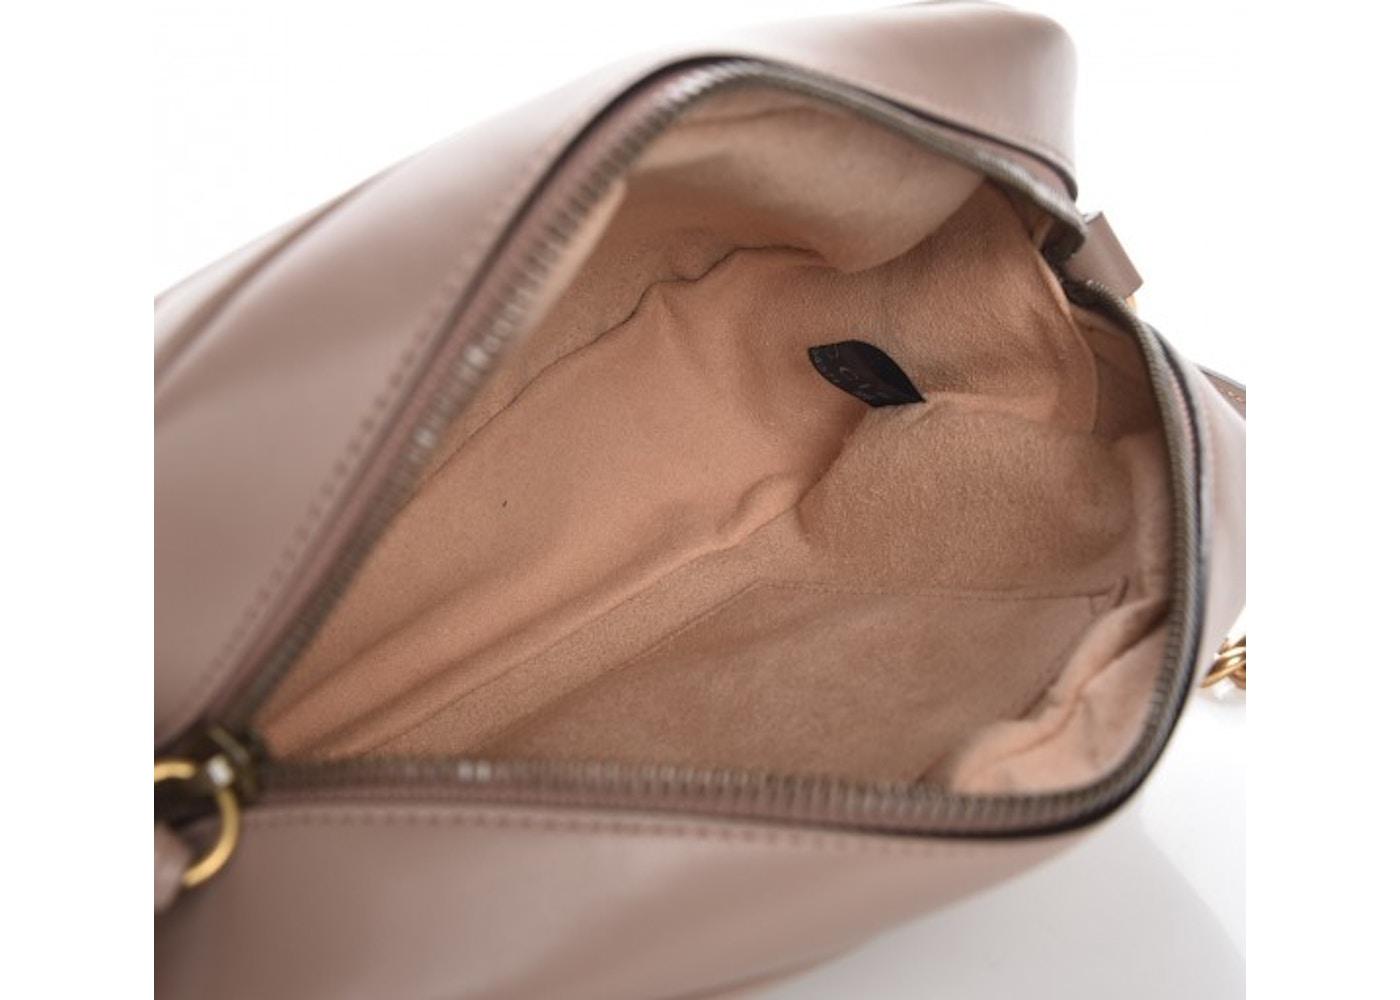 212d0ffe087 Gucci Marmont Camera Bag Matelasse GG Small Dusty Pink